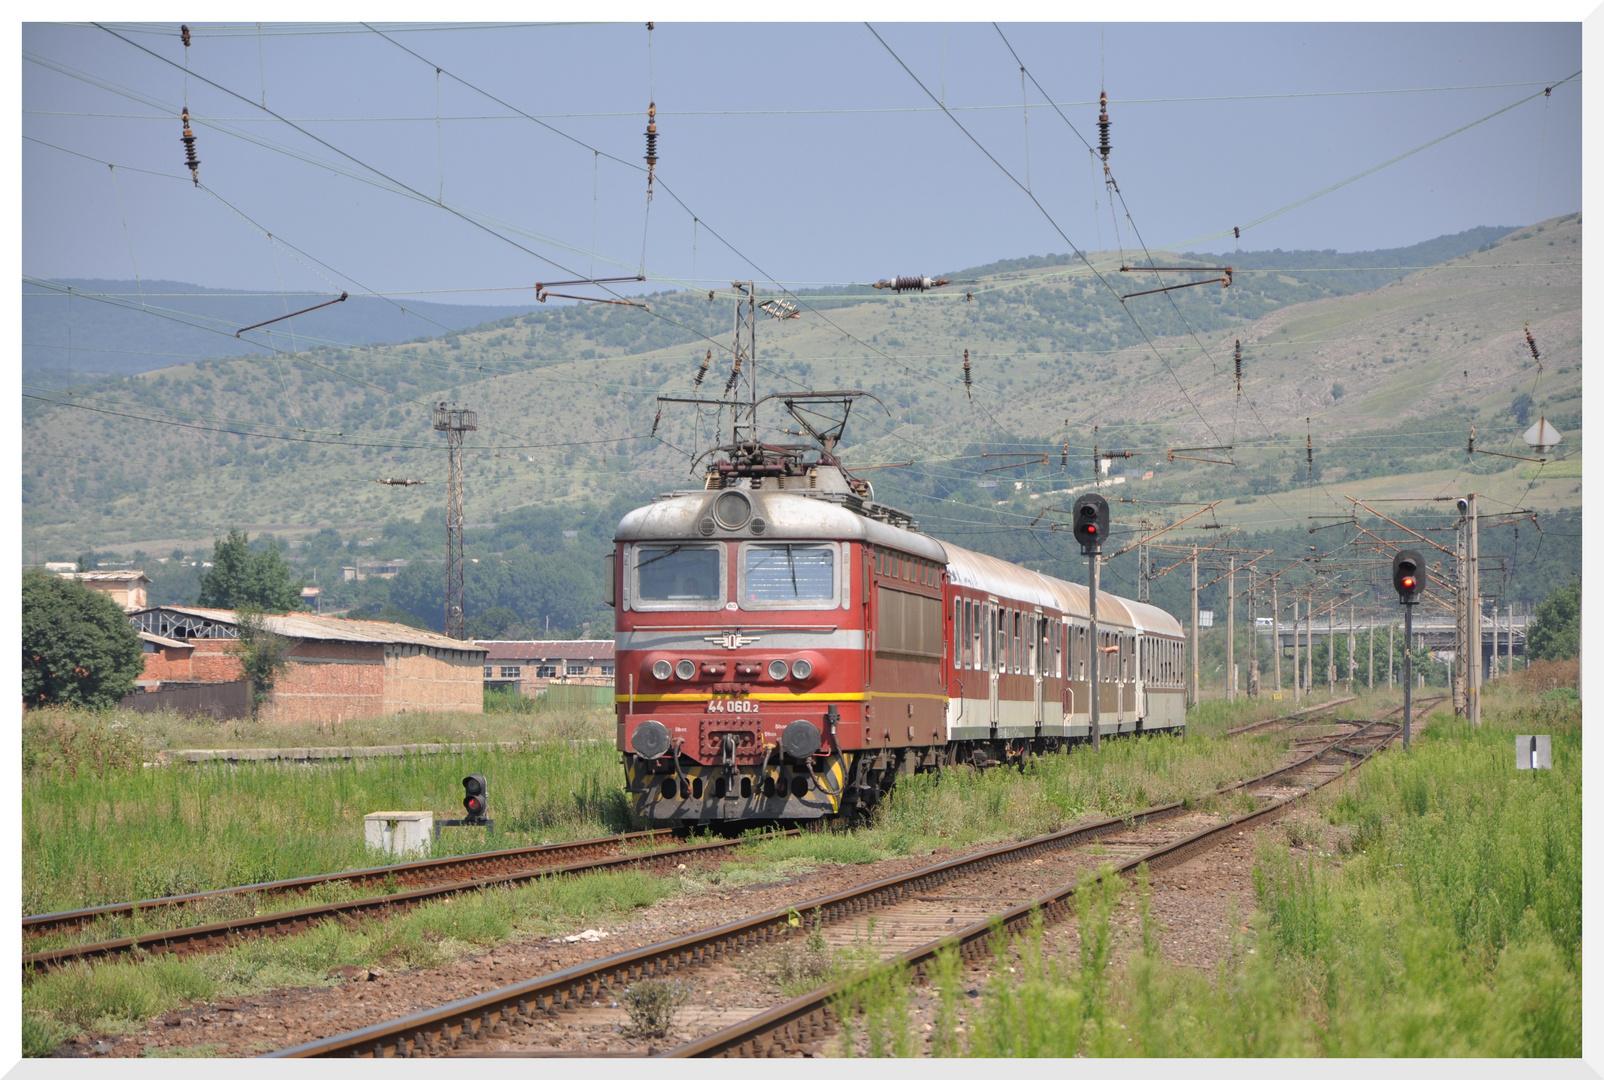 Personenzug in Aytos (Bulgarien)